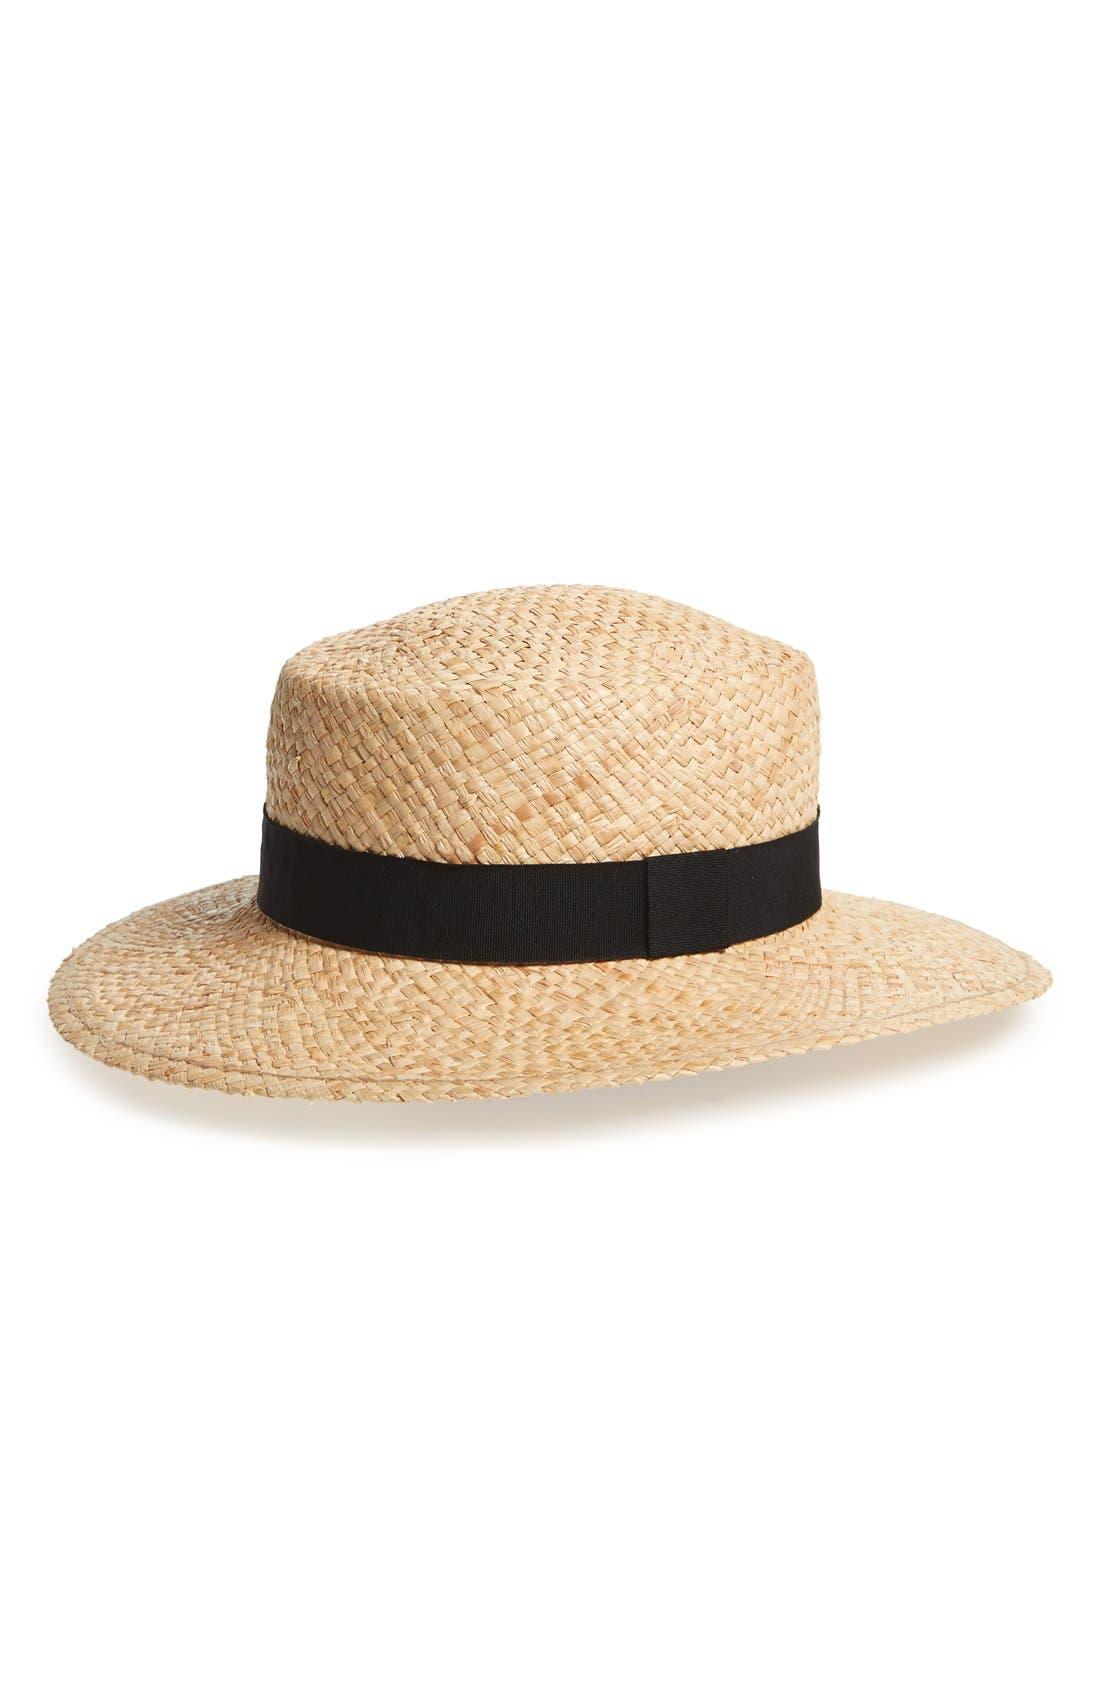 Alternate Image 1 Selected - BP. Woven Raffia Boater Hat